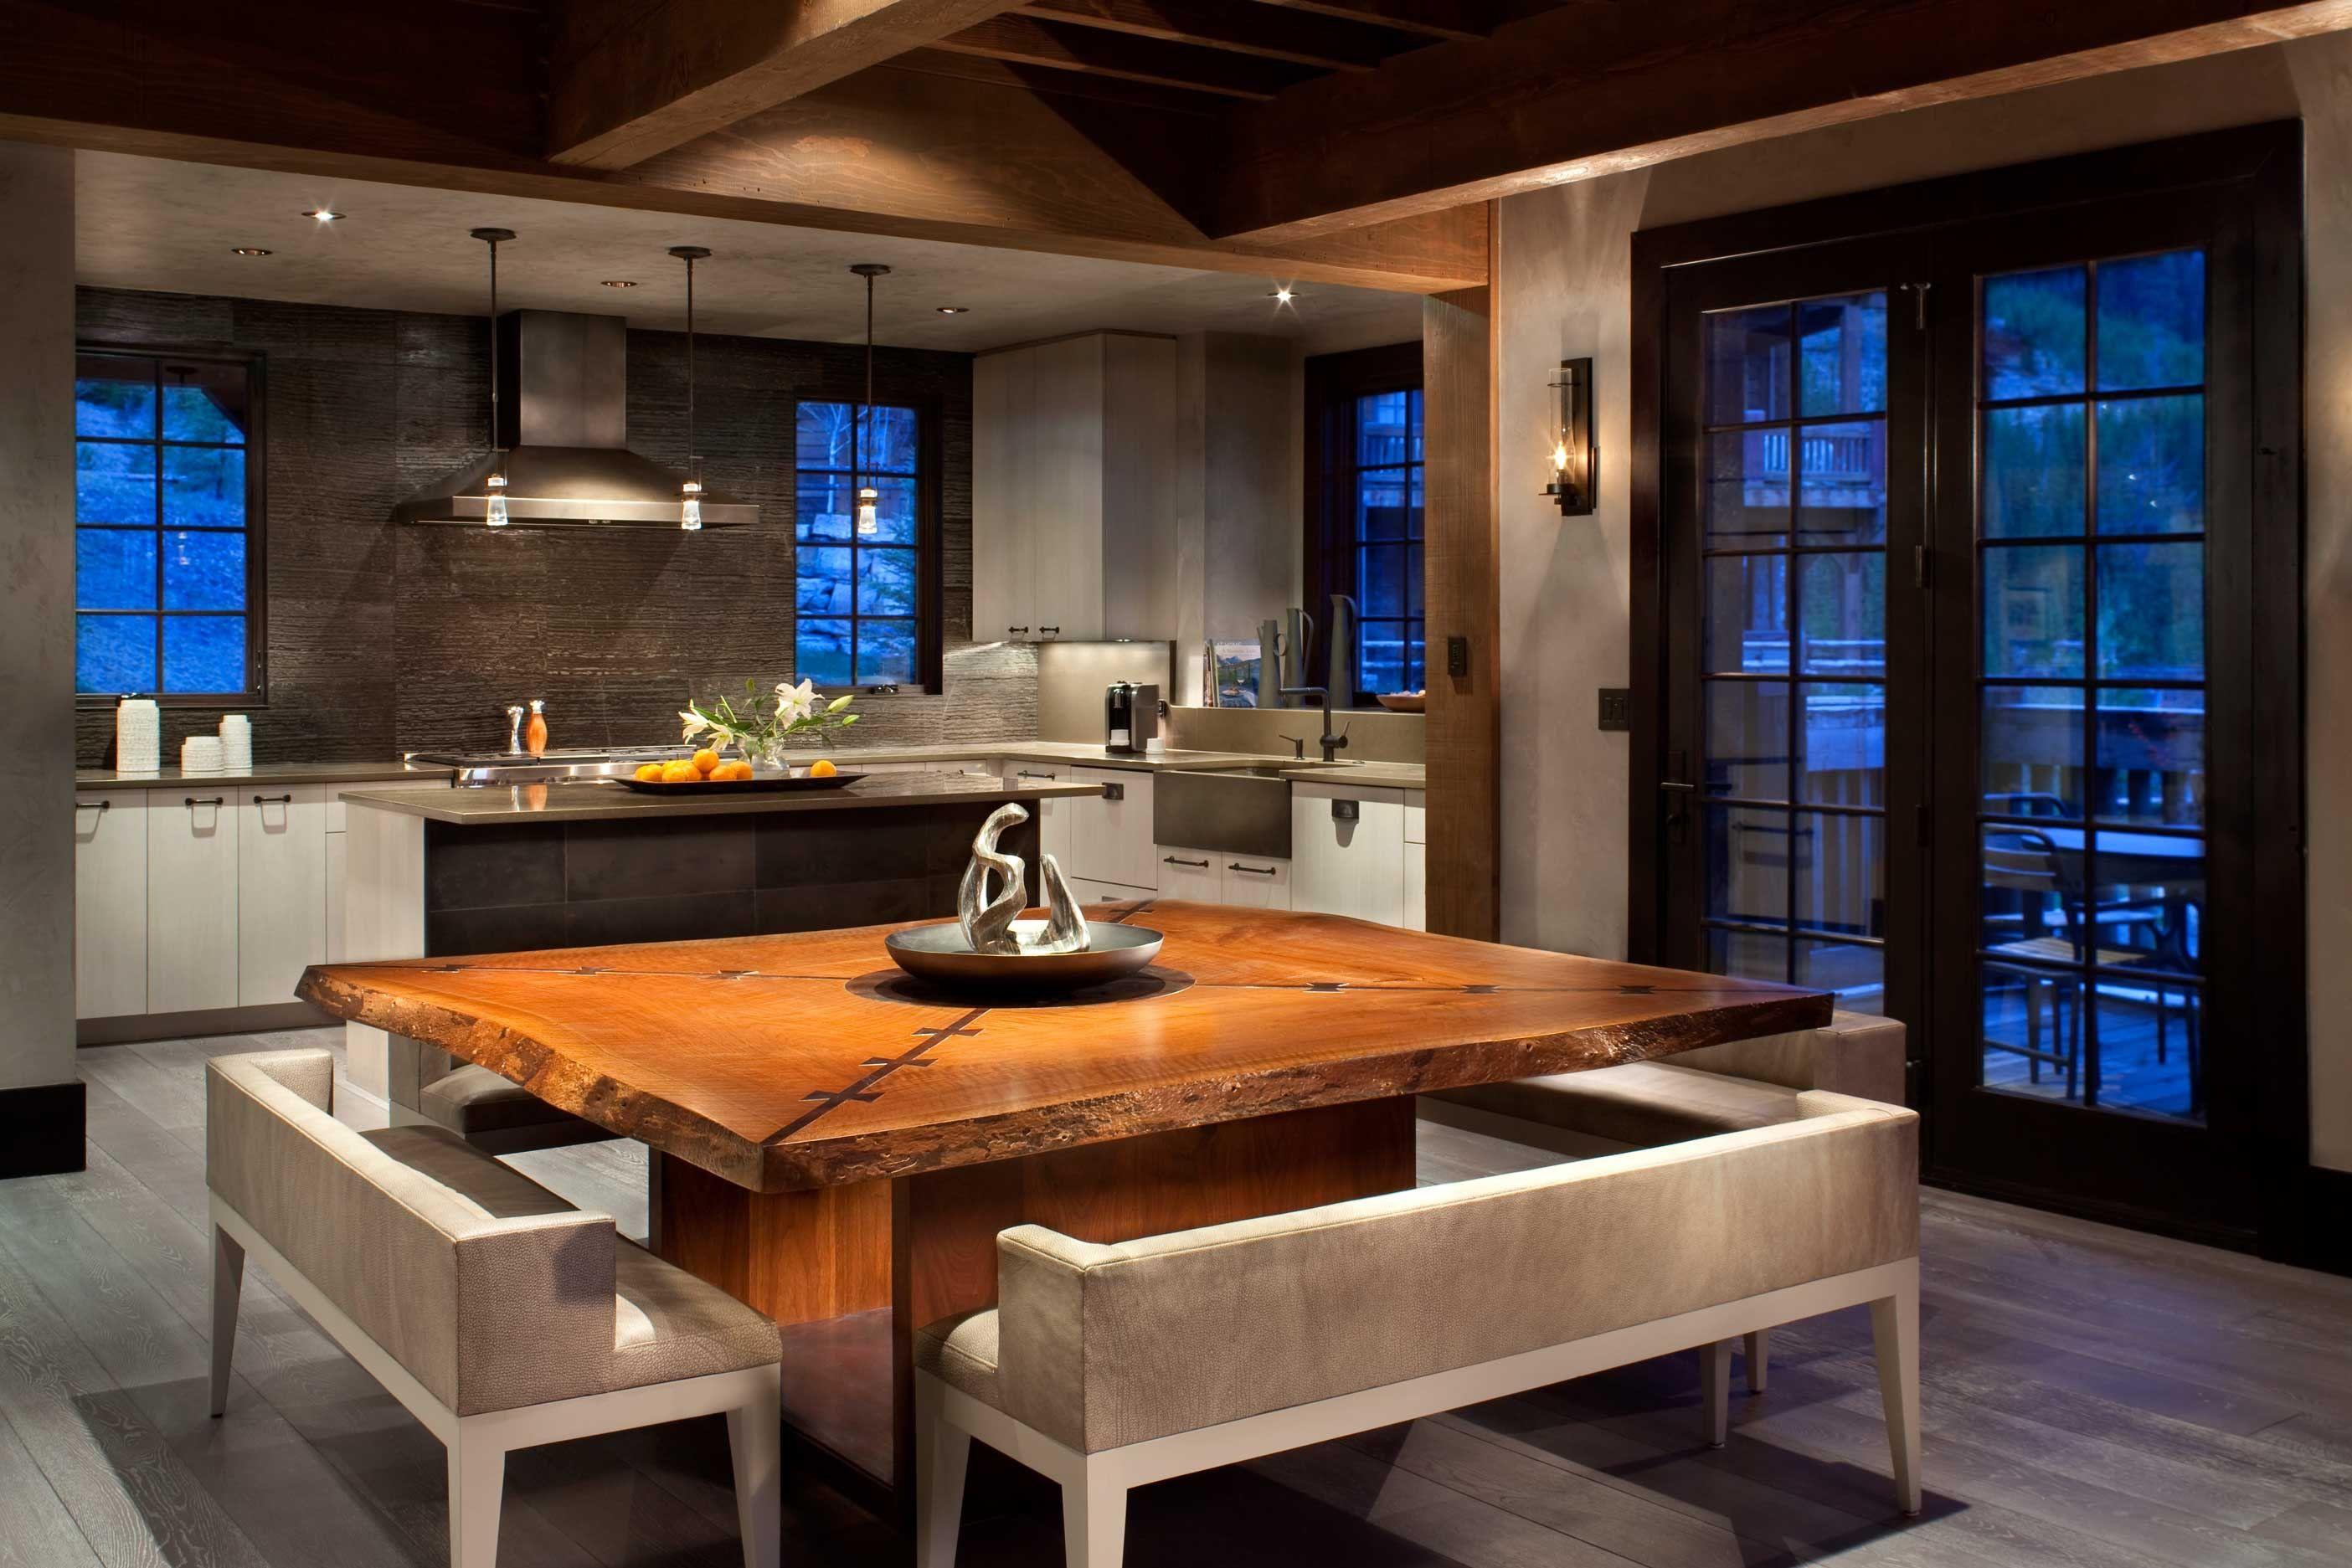 Enclave Residence Yellowstone Club Mt Kitchen ダイニング インテリア インテリア 実例